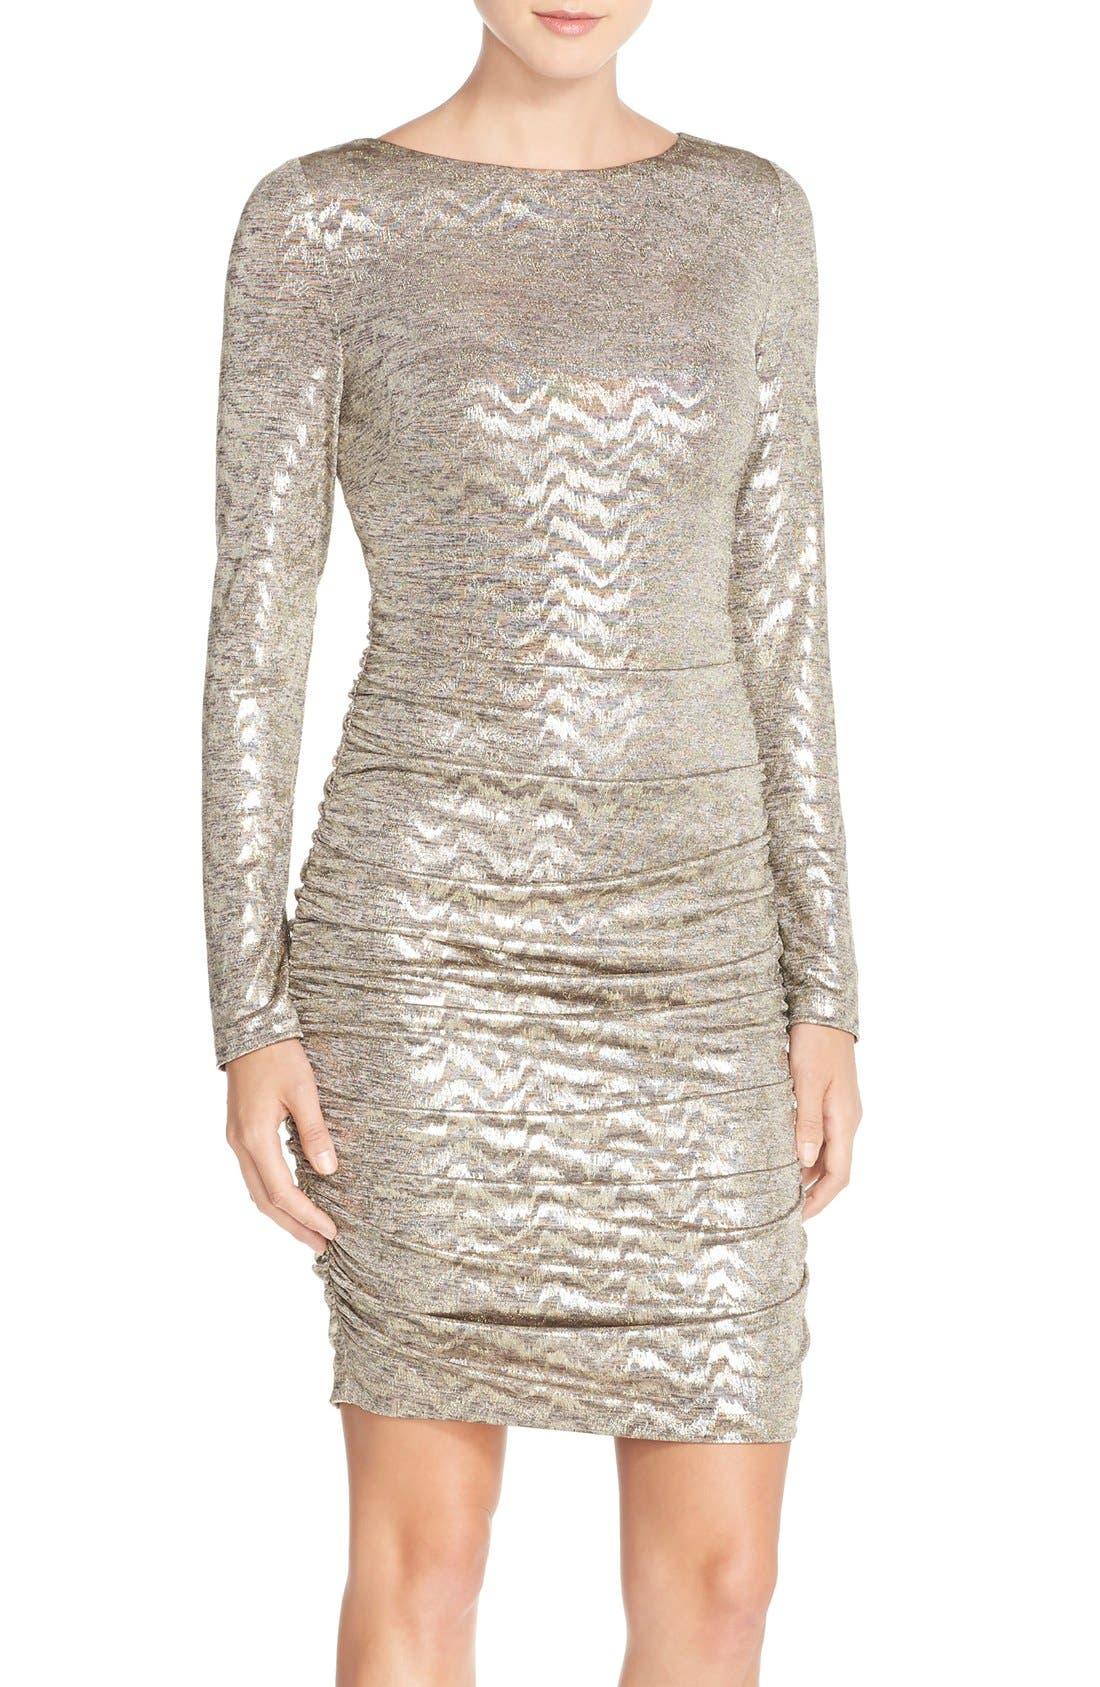 VINCE CAMUTO, Metallic Jersey Body-Con Dress, Main thumbnail 1, color, 710